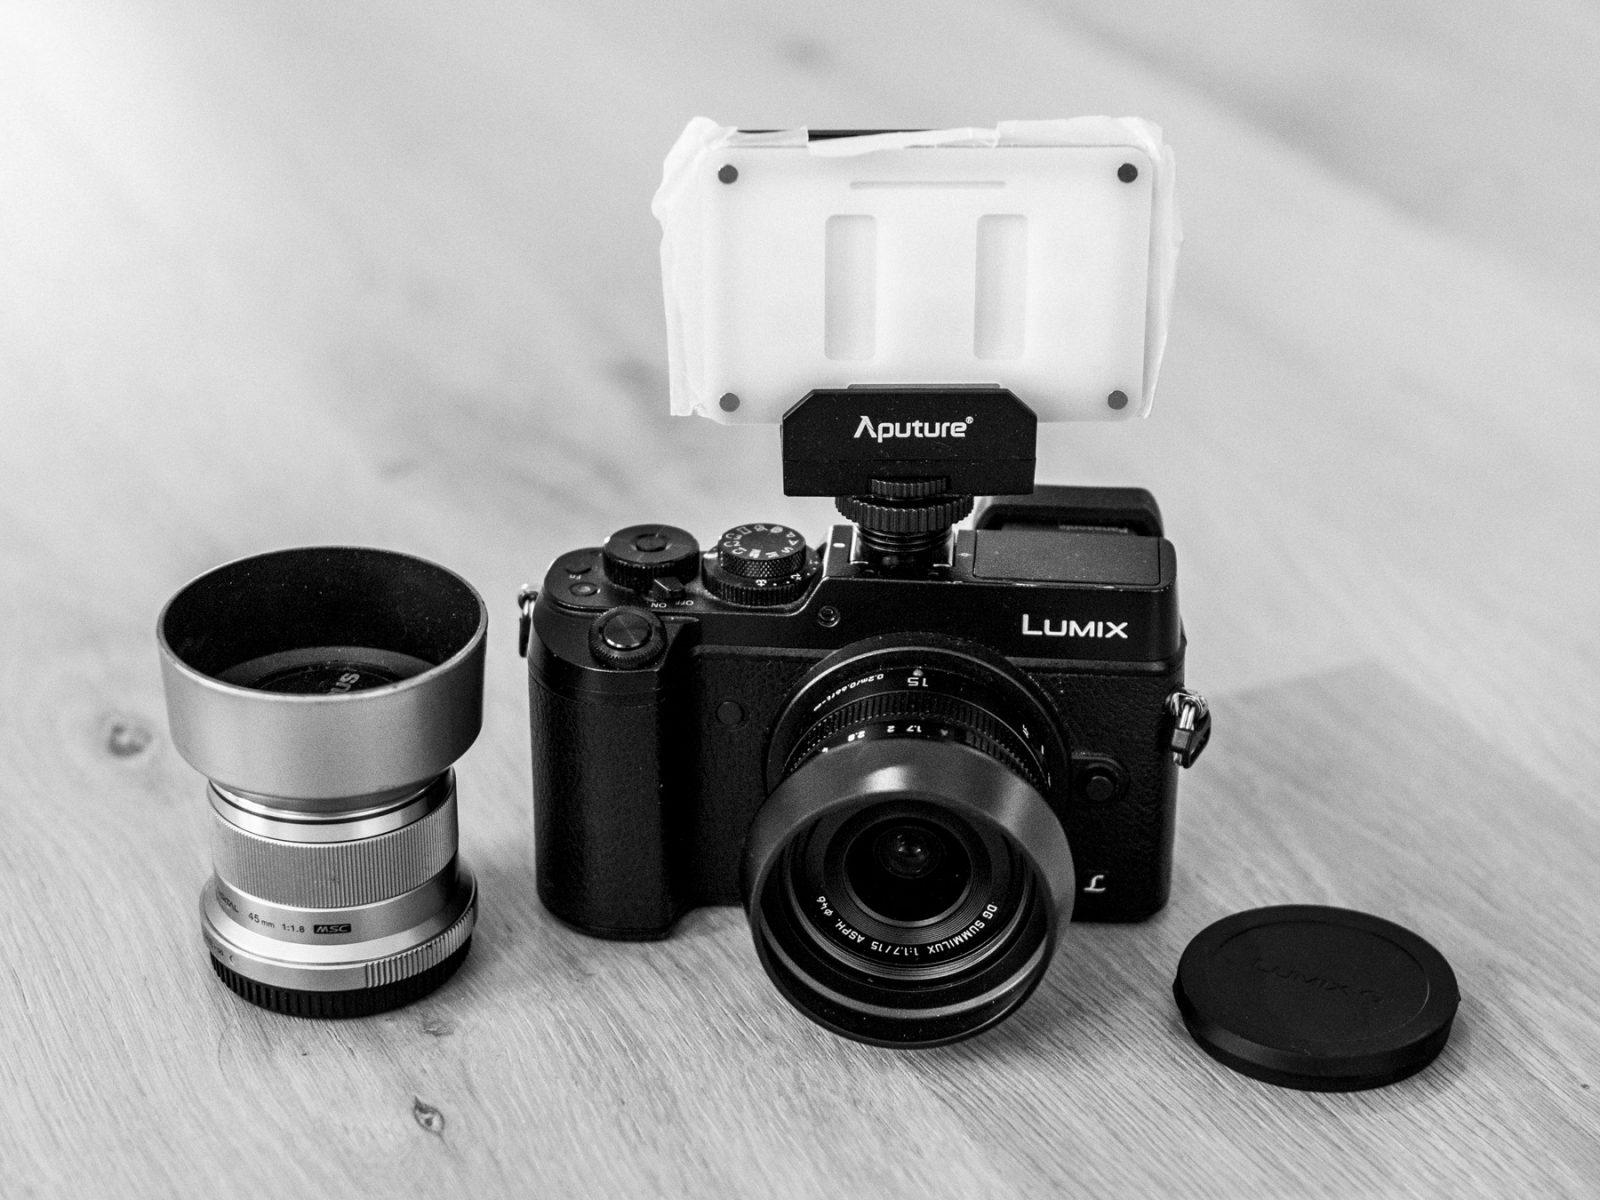 Panasonic Lumix GX8, Panasonic 15mm f/1.7, Olympus 42.5mm f/1.8 og Aputure Amaran AL-M9